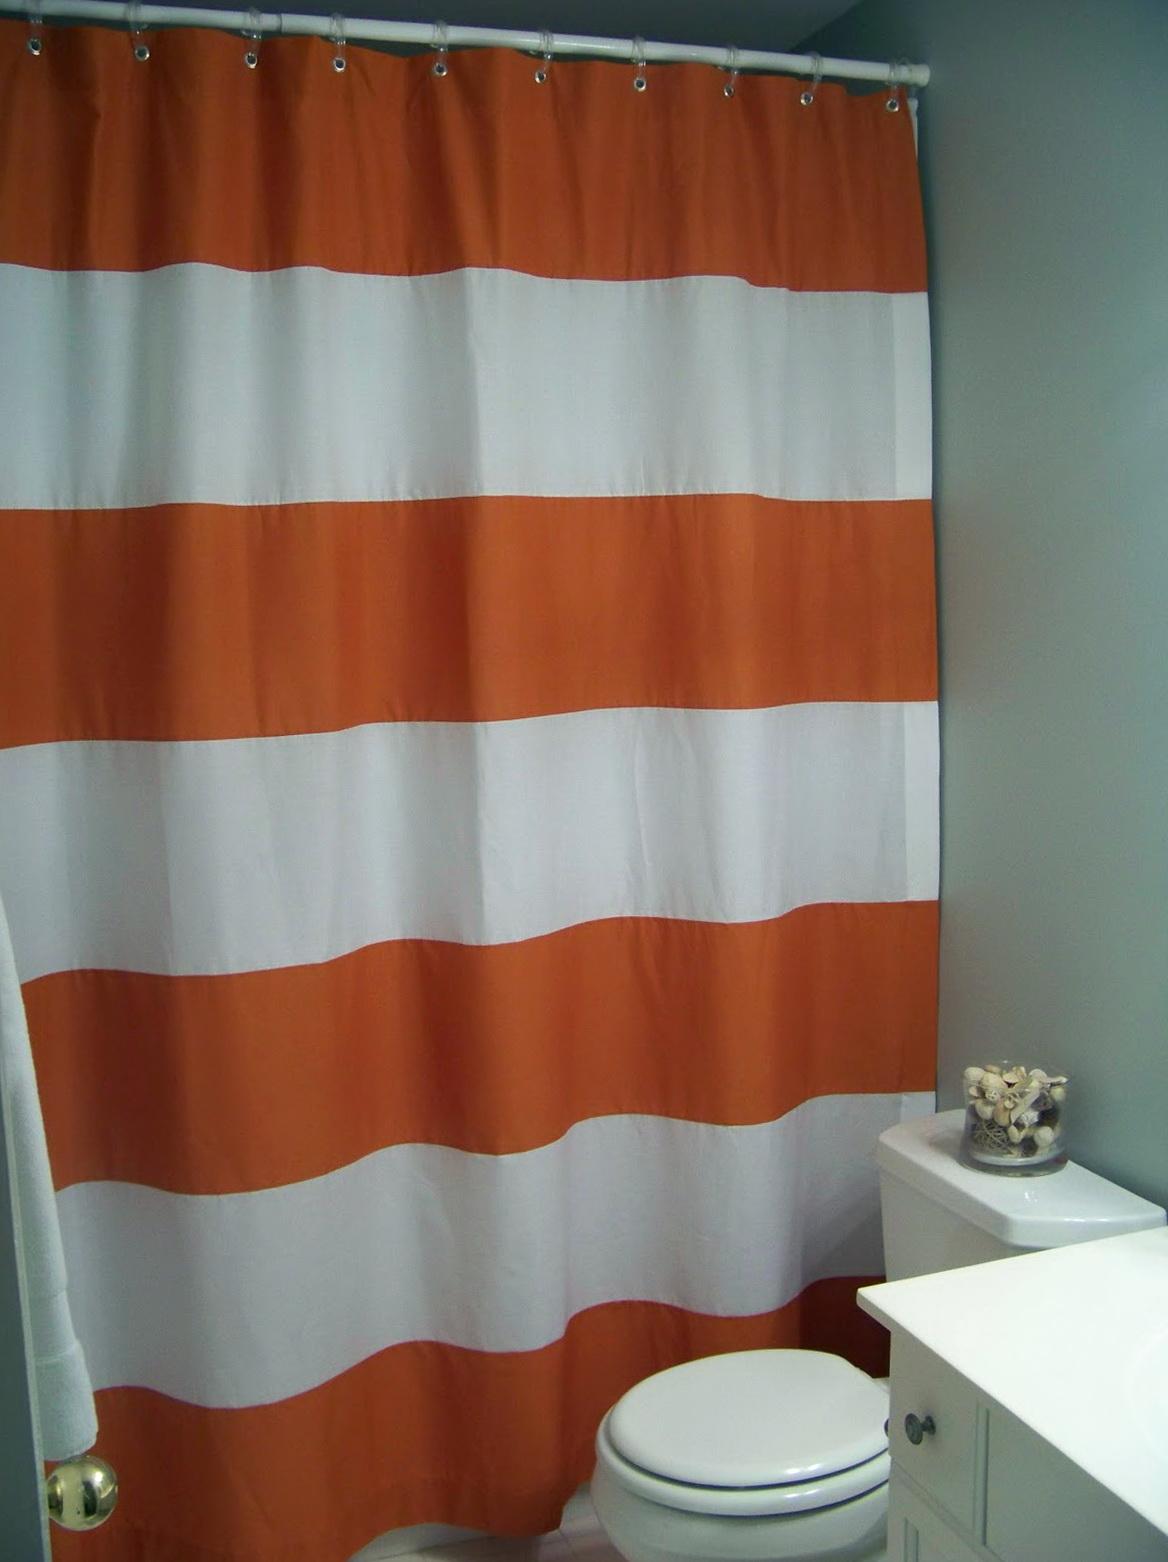 Horizontal Striped Shower Curtains Home Design Ideas